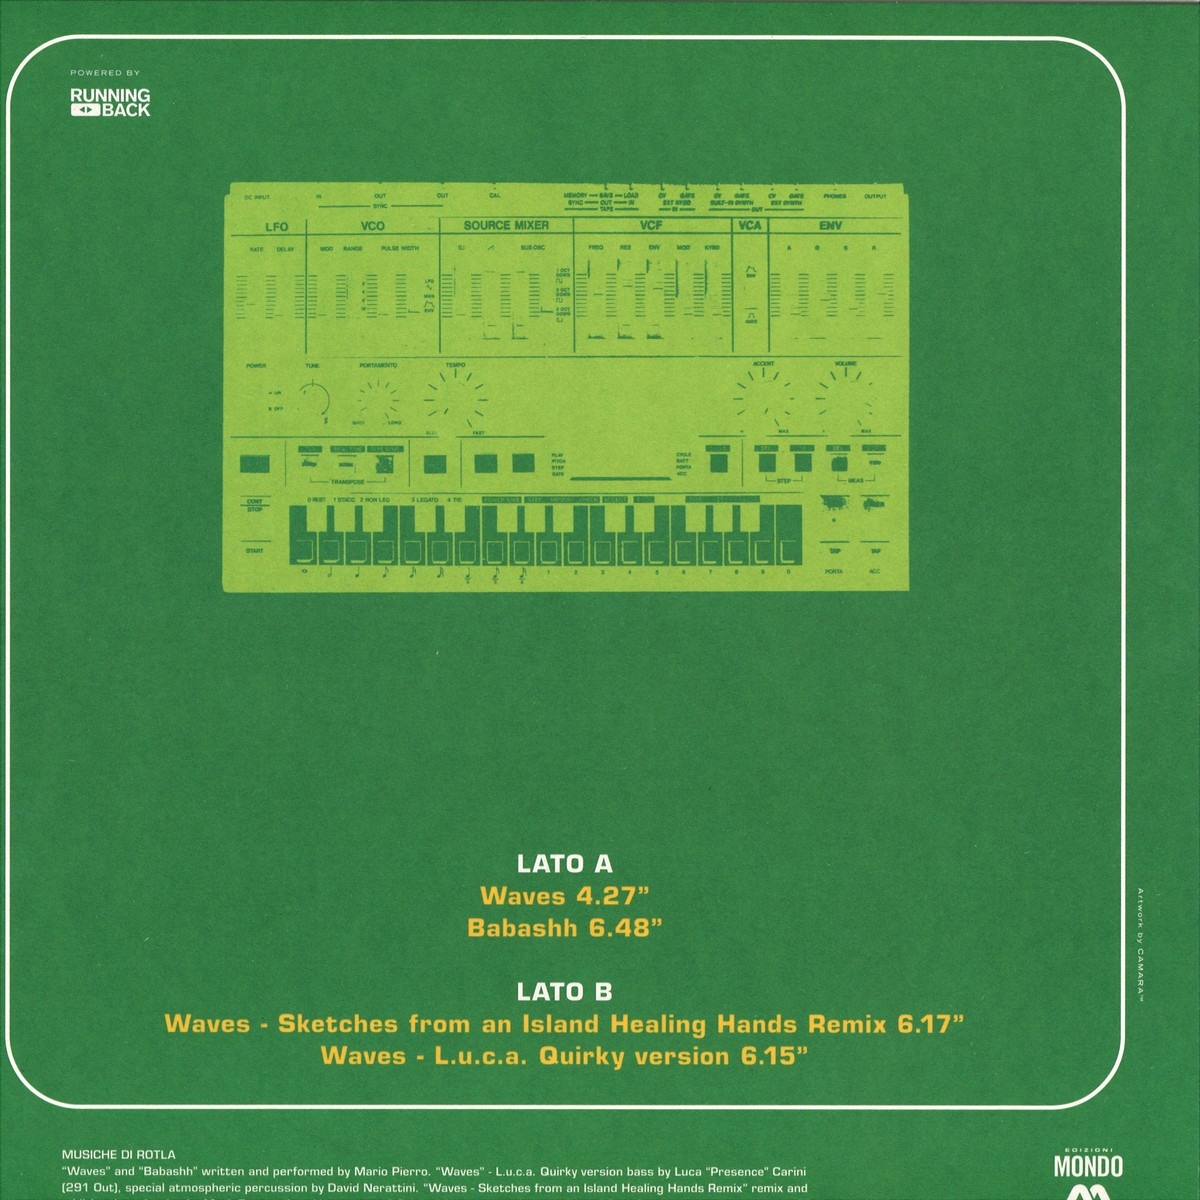 yoshio suzuki – touch of rain (1986)